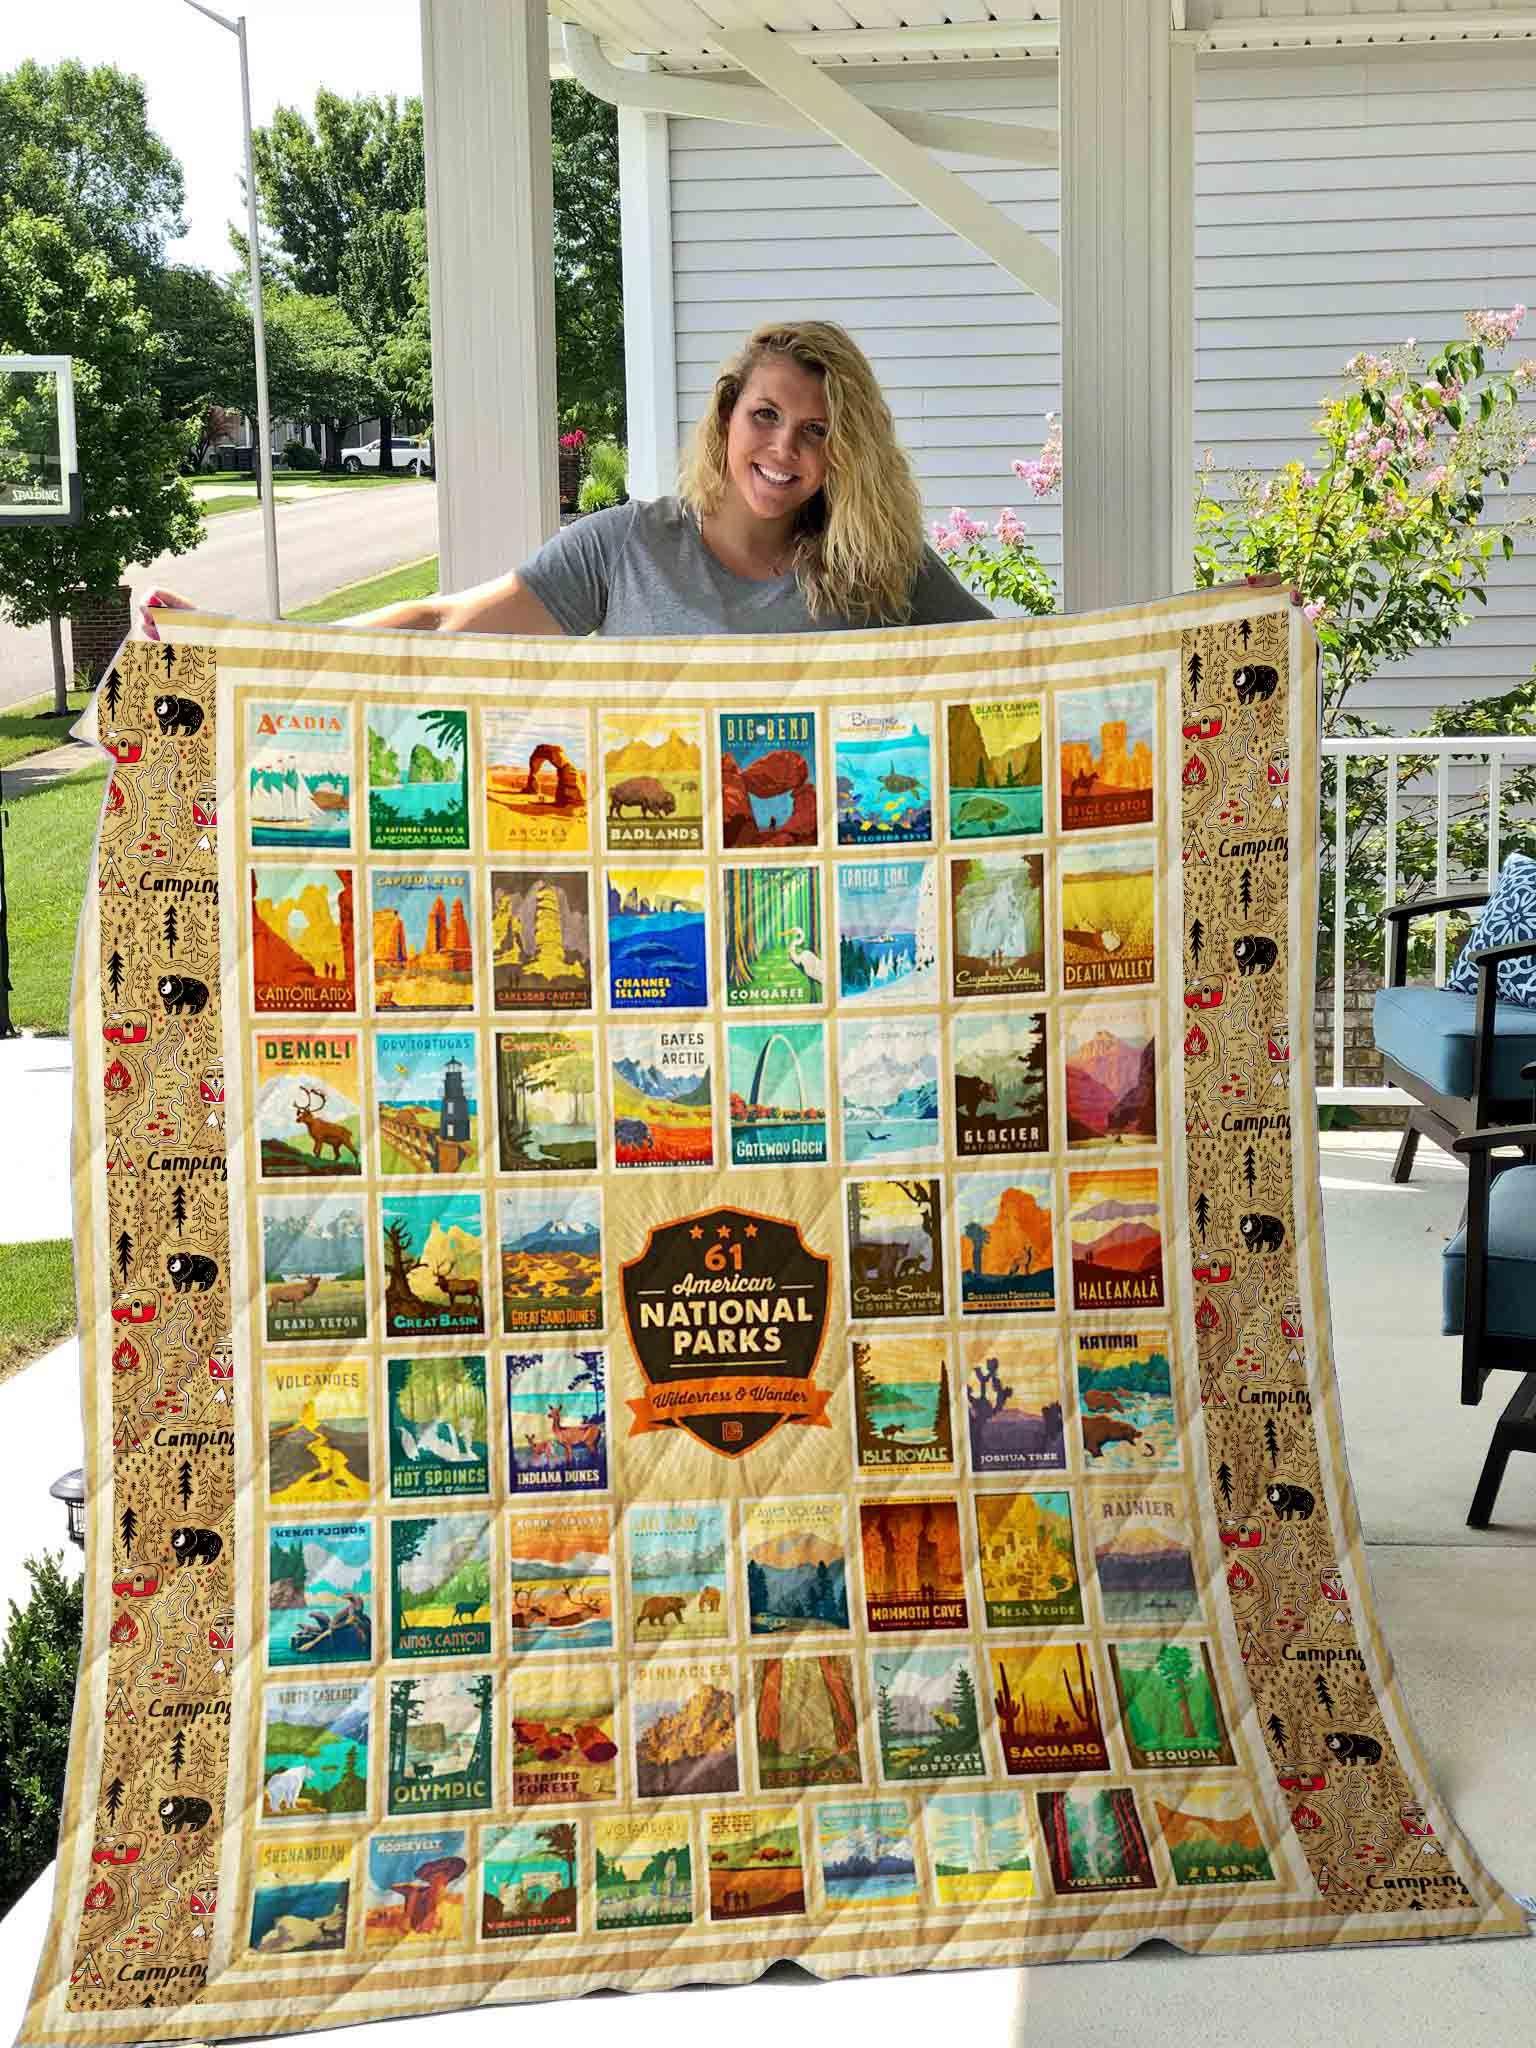 American National Park Quilt Blanket 03 American National Parks National Parks Quilt Piecing